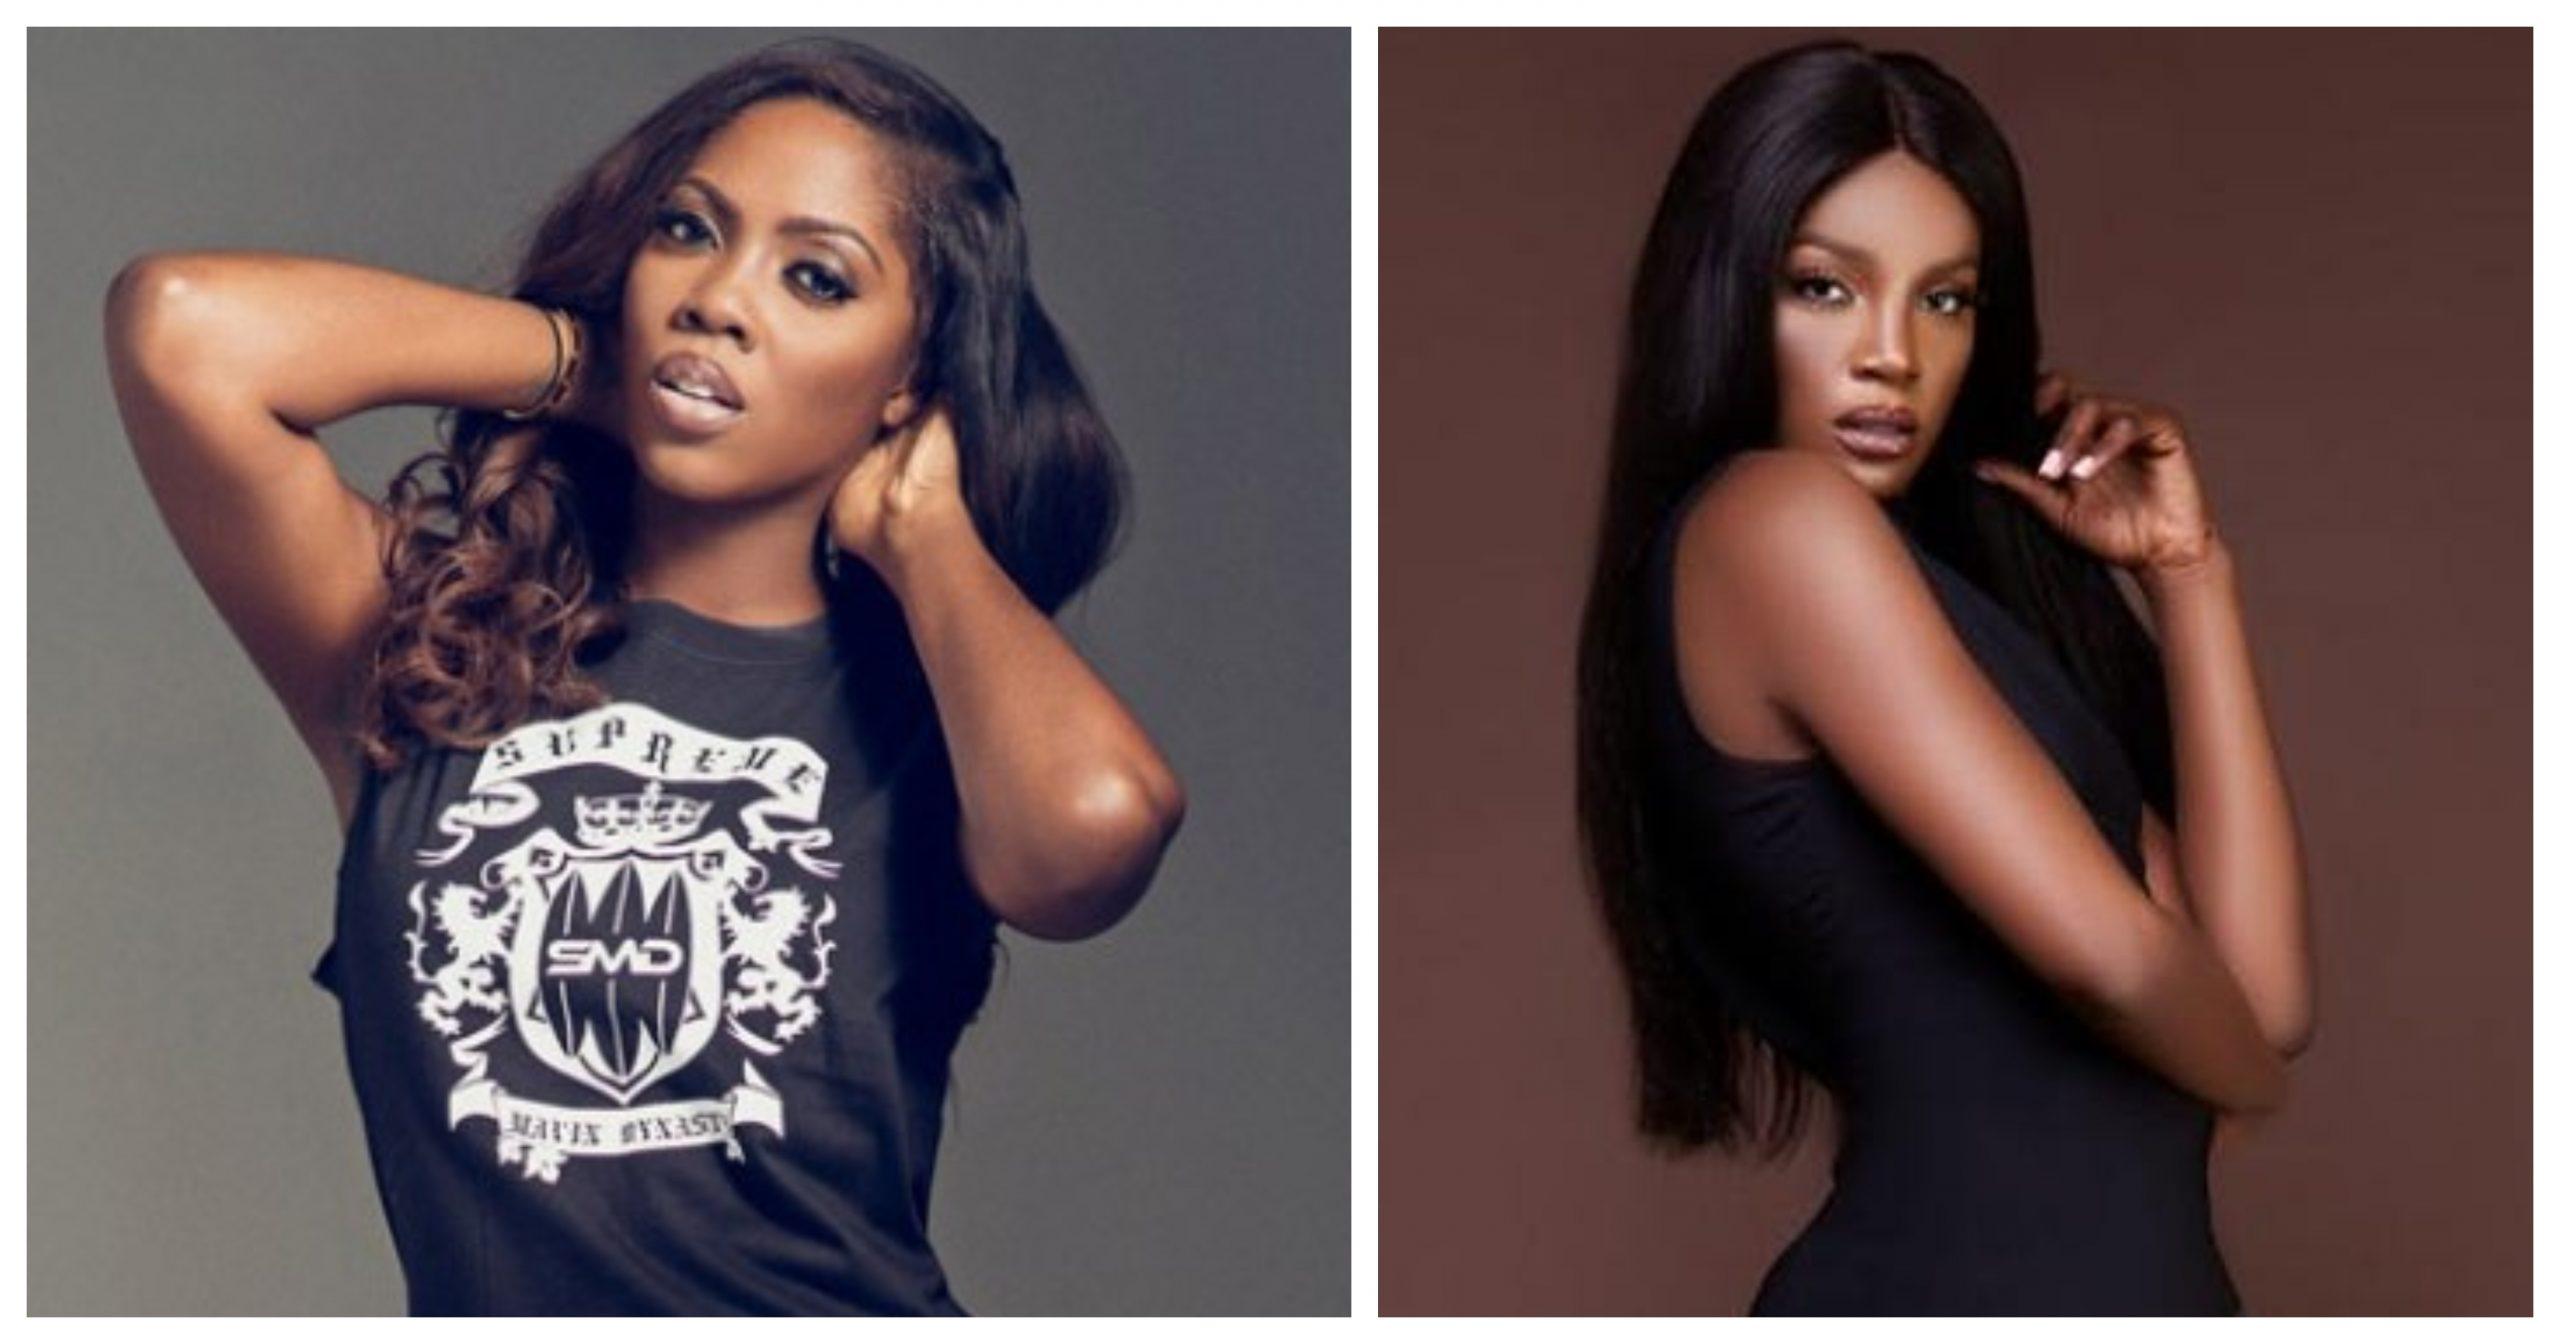 Shocking! Tiwa Savage & Seyi Shay Have Heated Confrontation In Nigerian  Hair Salon [Video] - That Grape Juice